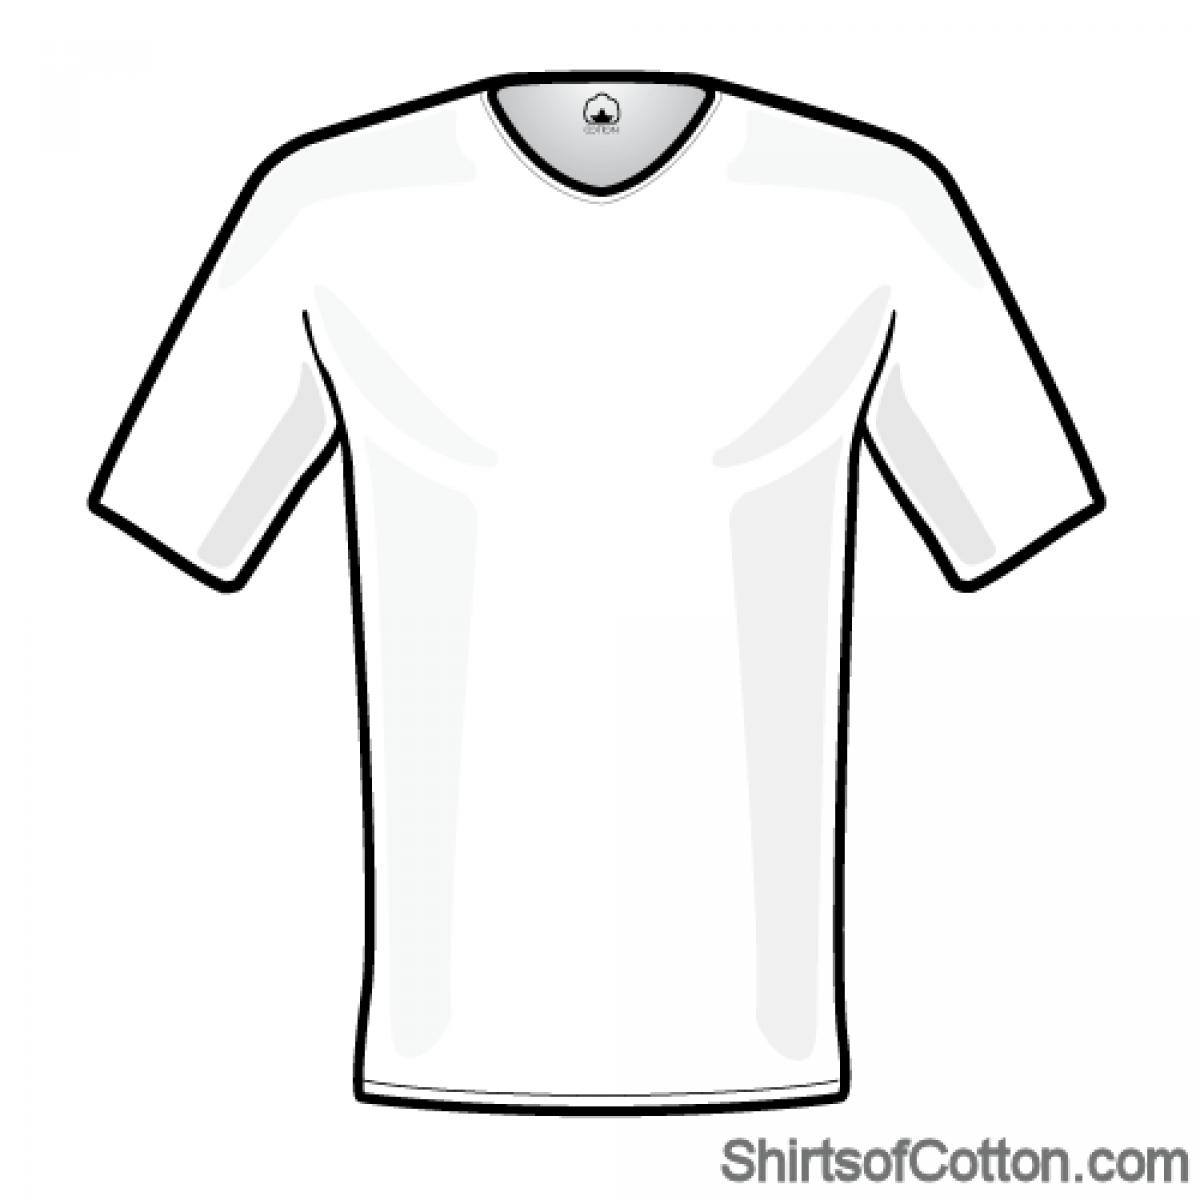 1200x1200 Perfect White Basic V Neck T Shirt By Shirtsofcotton